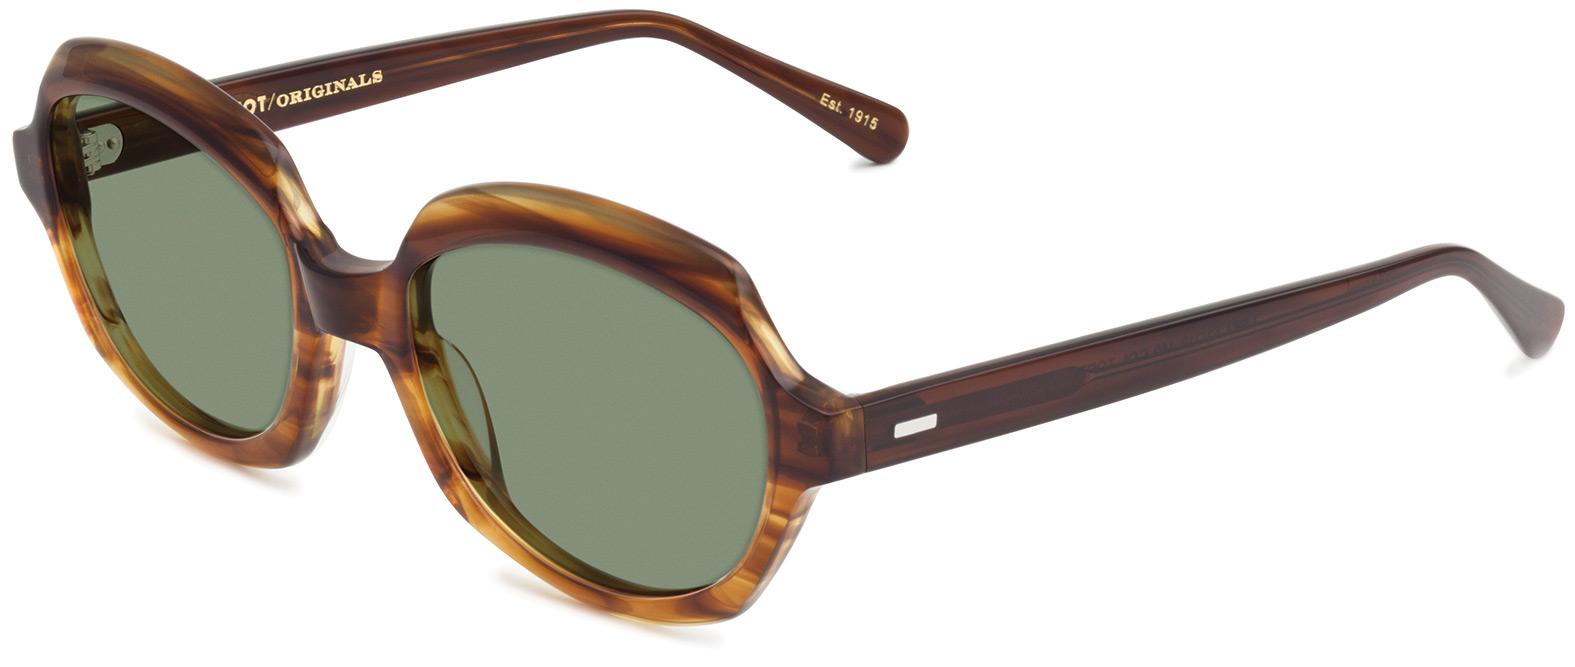 moscot-eyewear-ss2013-17